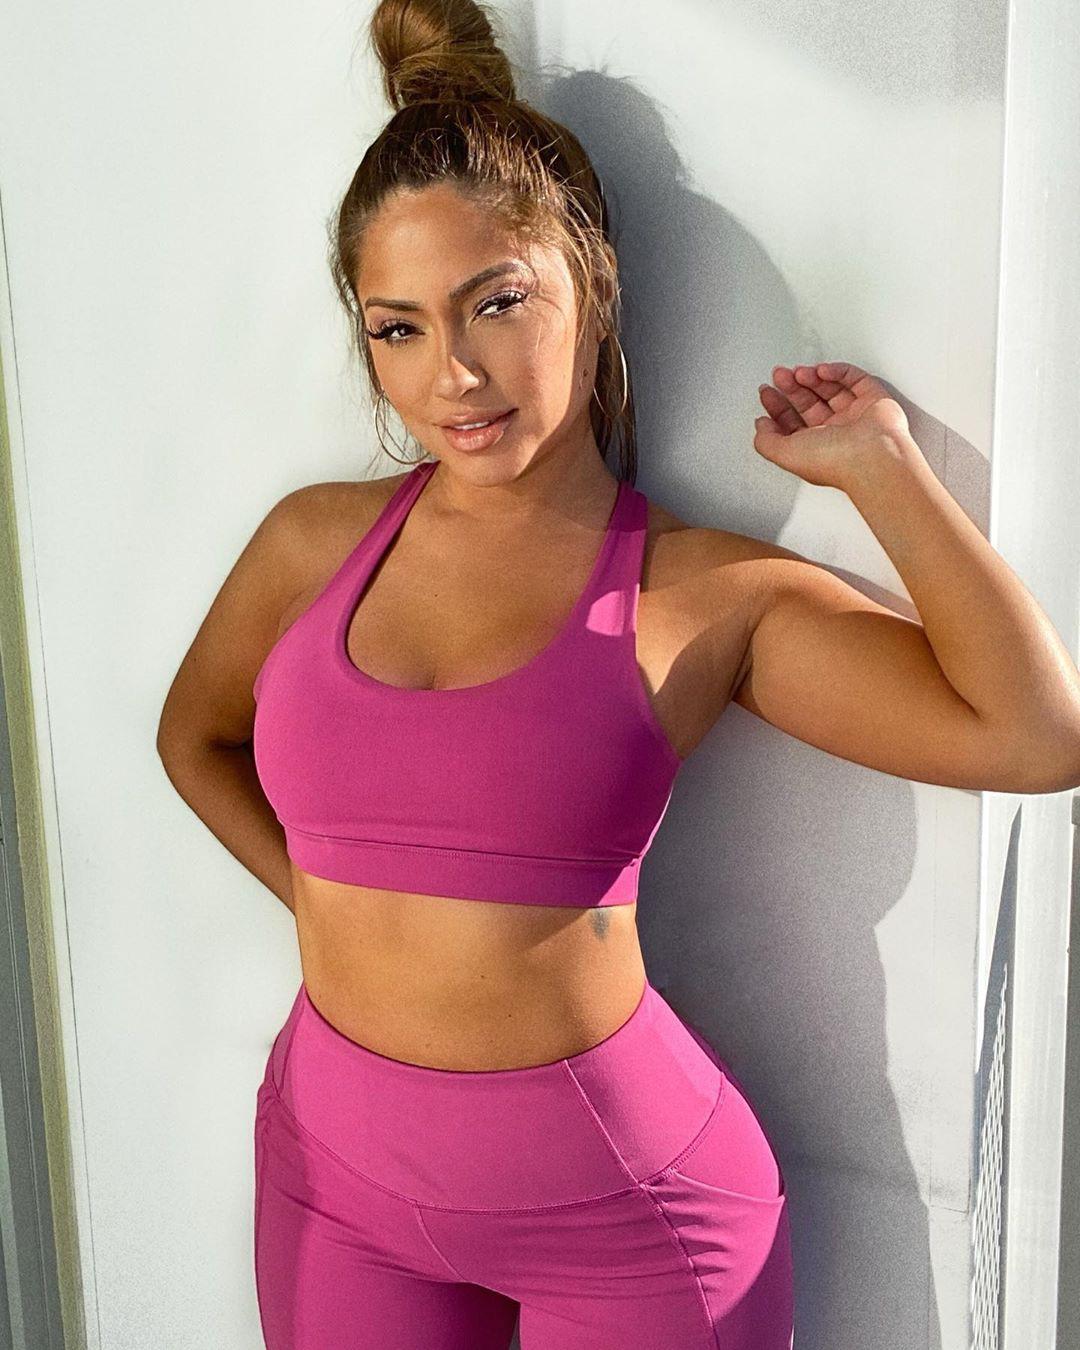 Jessica Burciaga active pants, sportswear clothing ideas, Outerwear